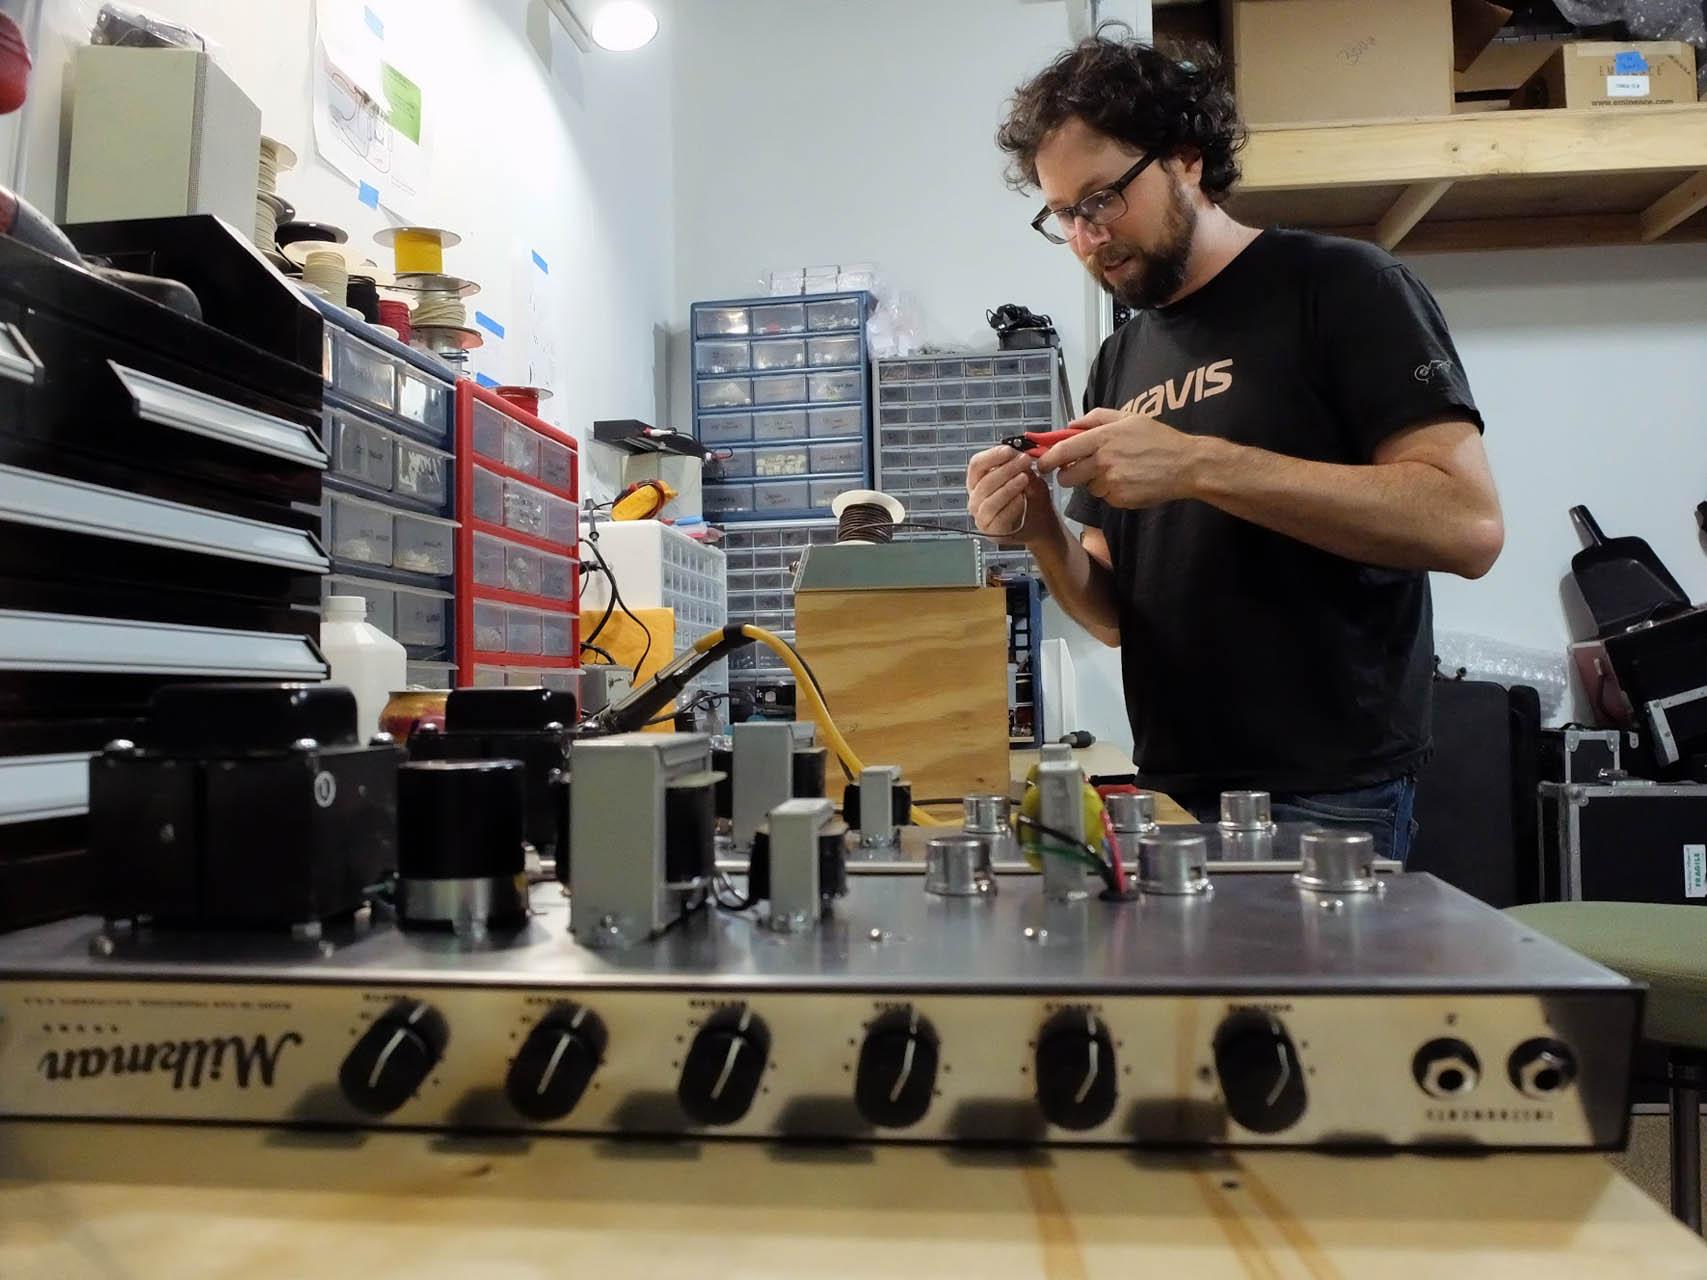 Bench Press Milkman Sound Amplifiers Fretboard Journal 300w High Power Amplifier Diy Circuit